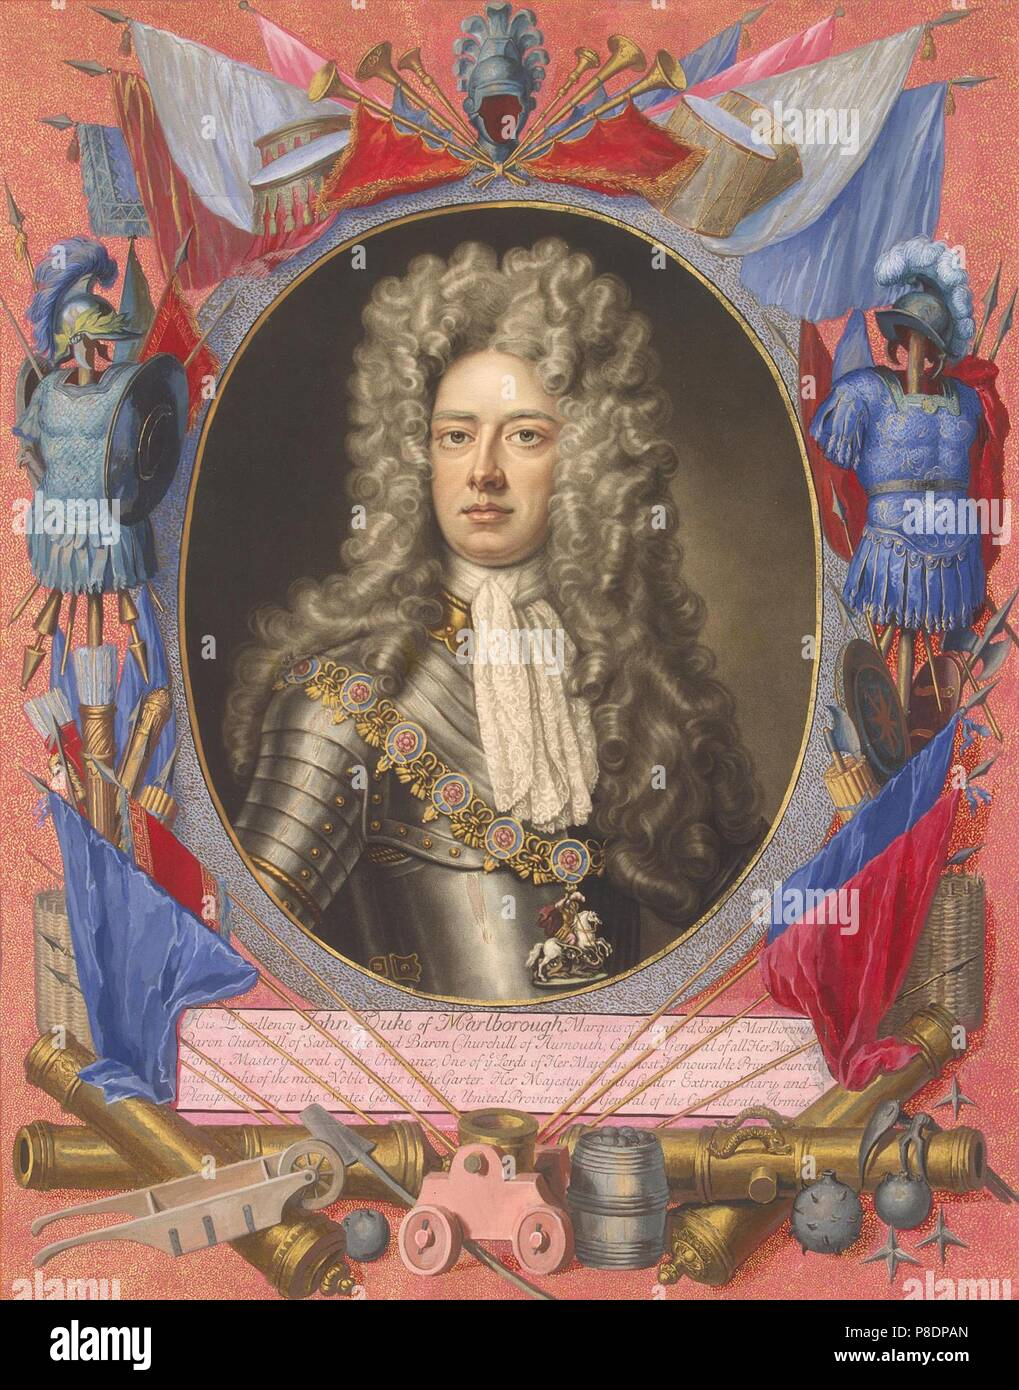 Portrait of John Churchill, 1st Duke of Marlborough (1650-1722). Museum: State Hermitage, St. Petersburg. - Stock Image